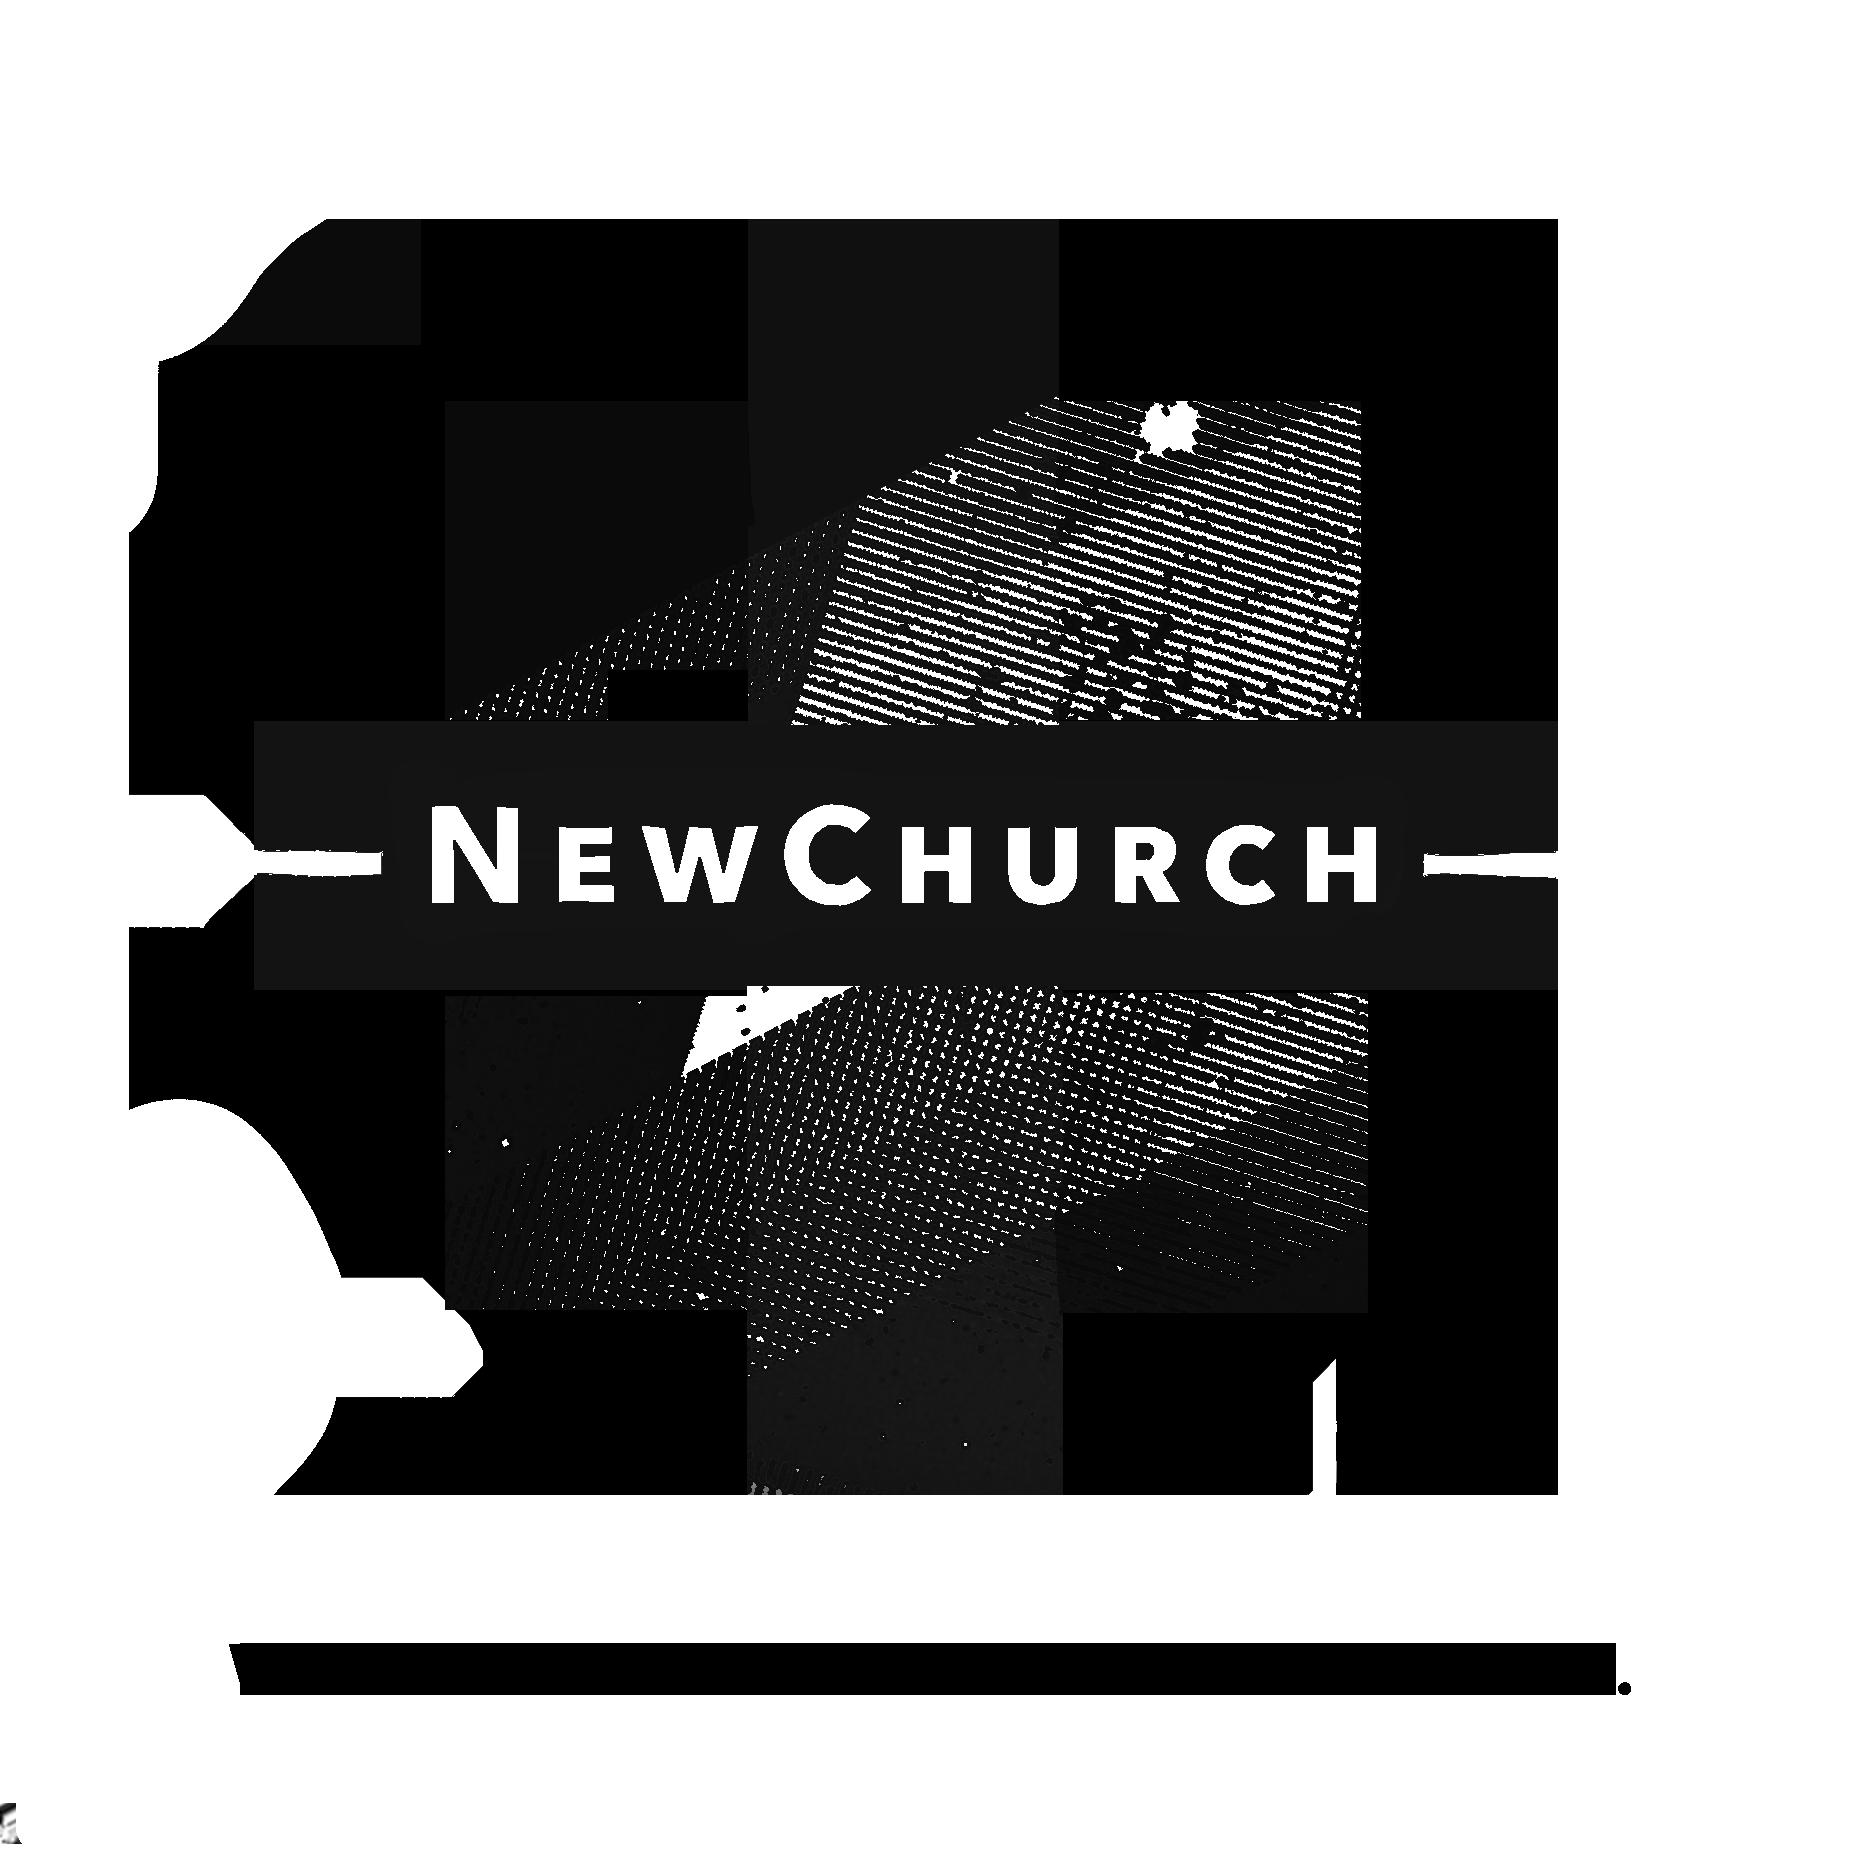 NewChurch-Cross_logo-refresh—Final cross-1 color BLK2.png